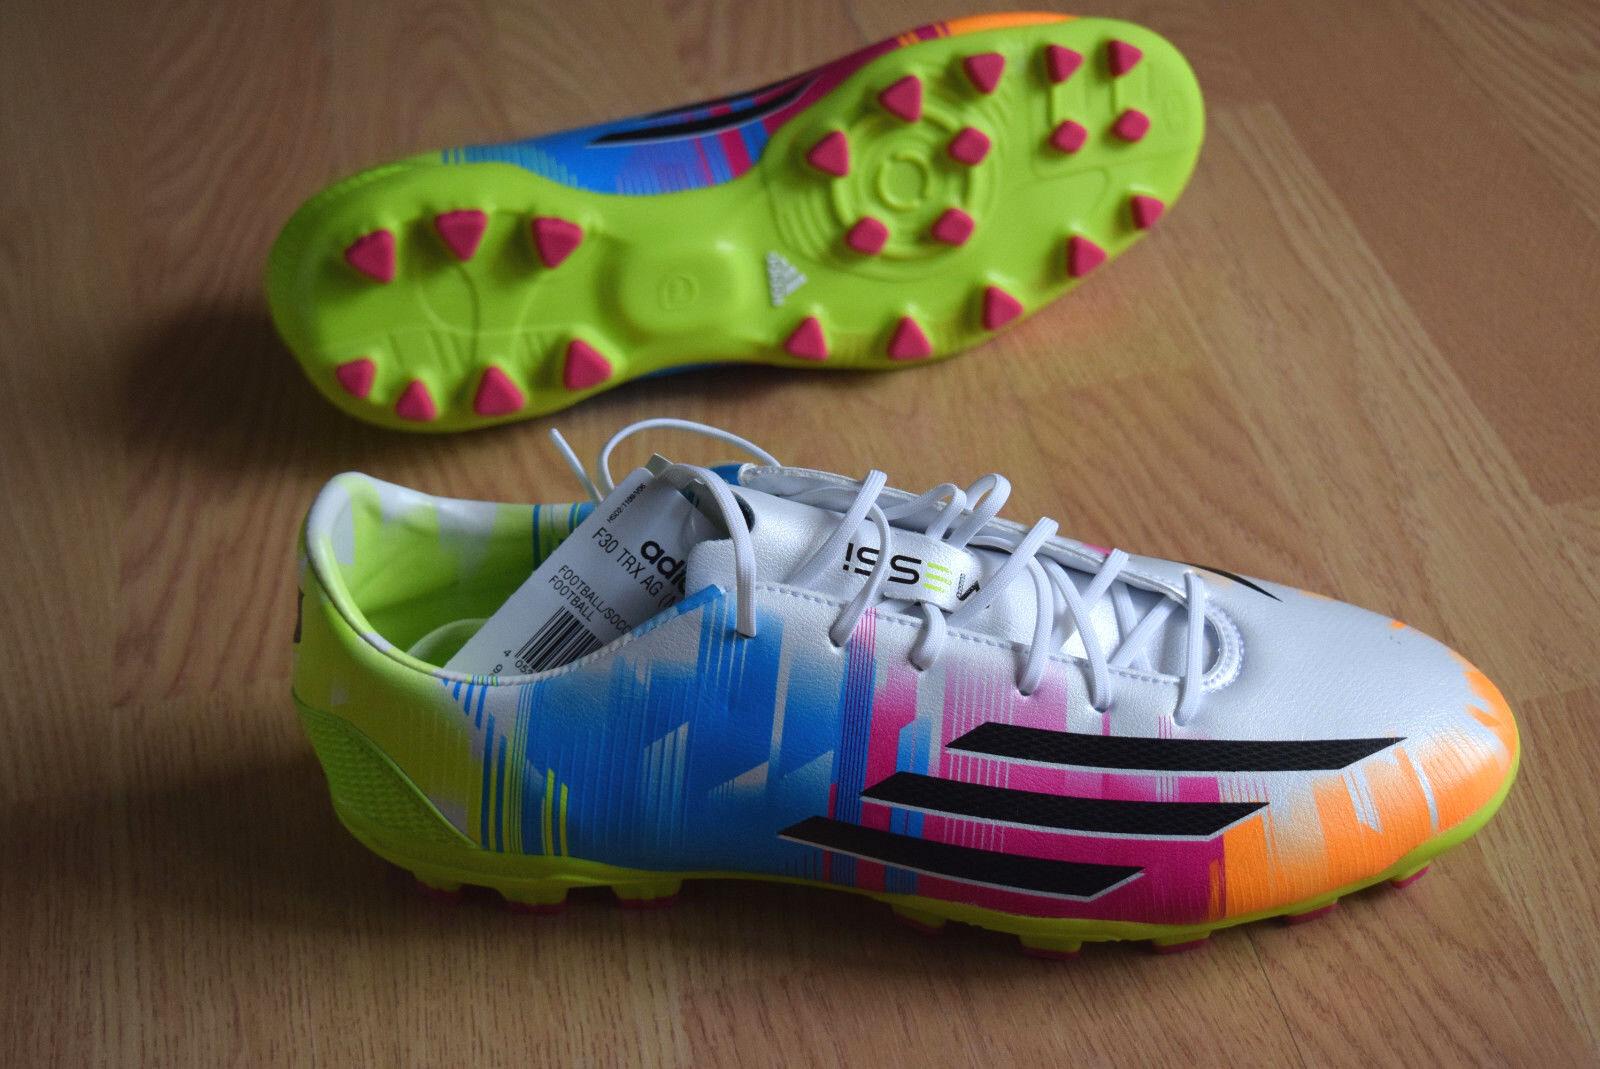 F30 adidas TRX AG messi 42 43 44 47 botas de fútbol d67178 15.1 10.1 Projoator